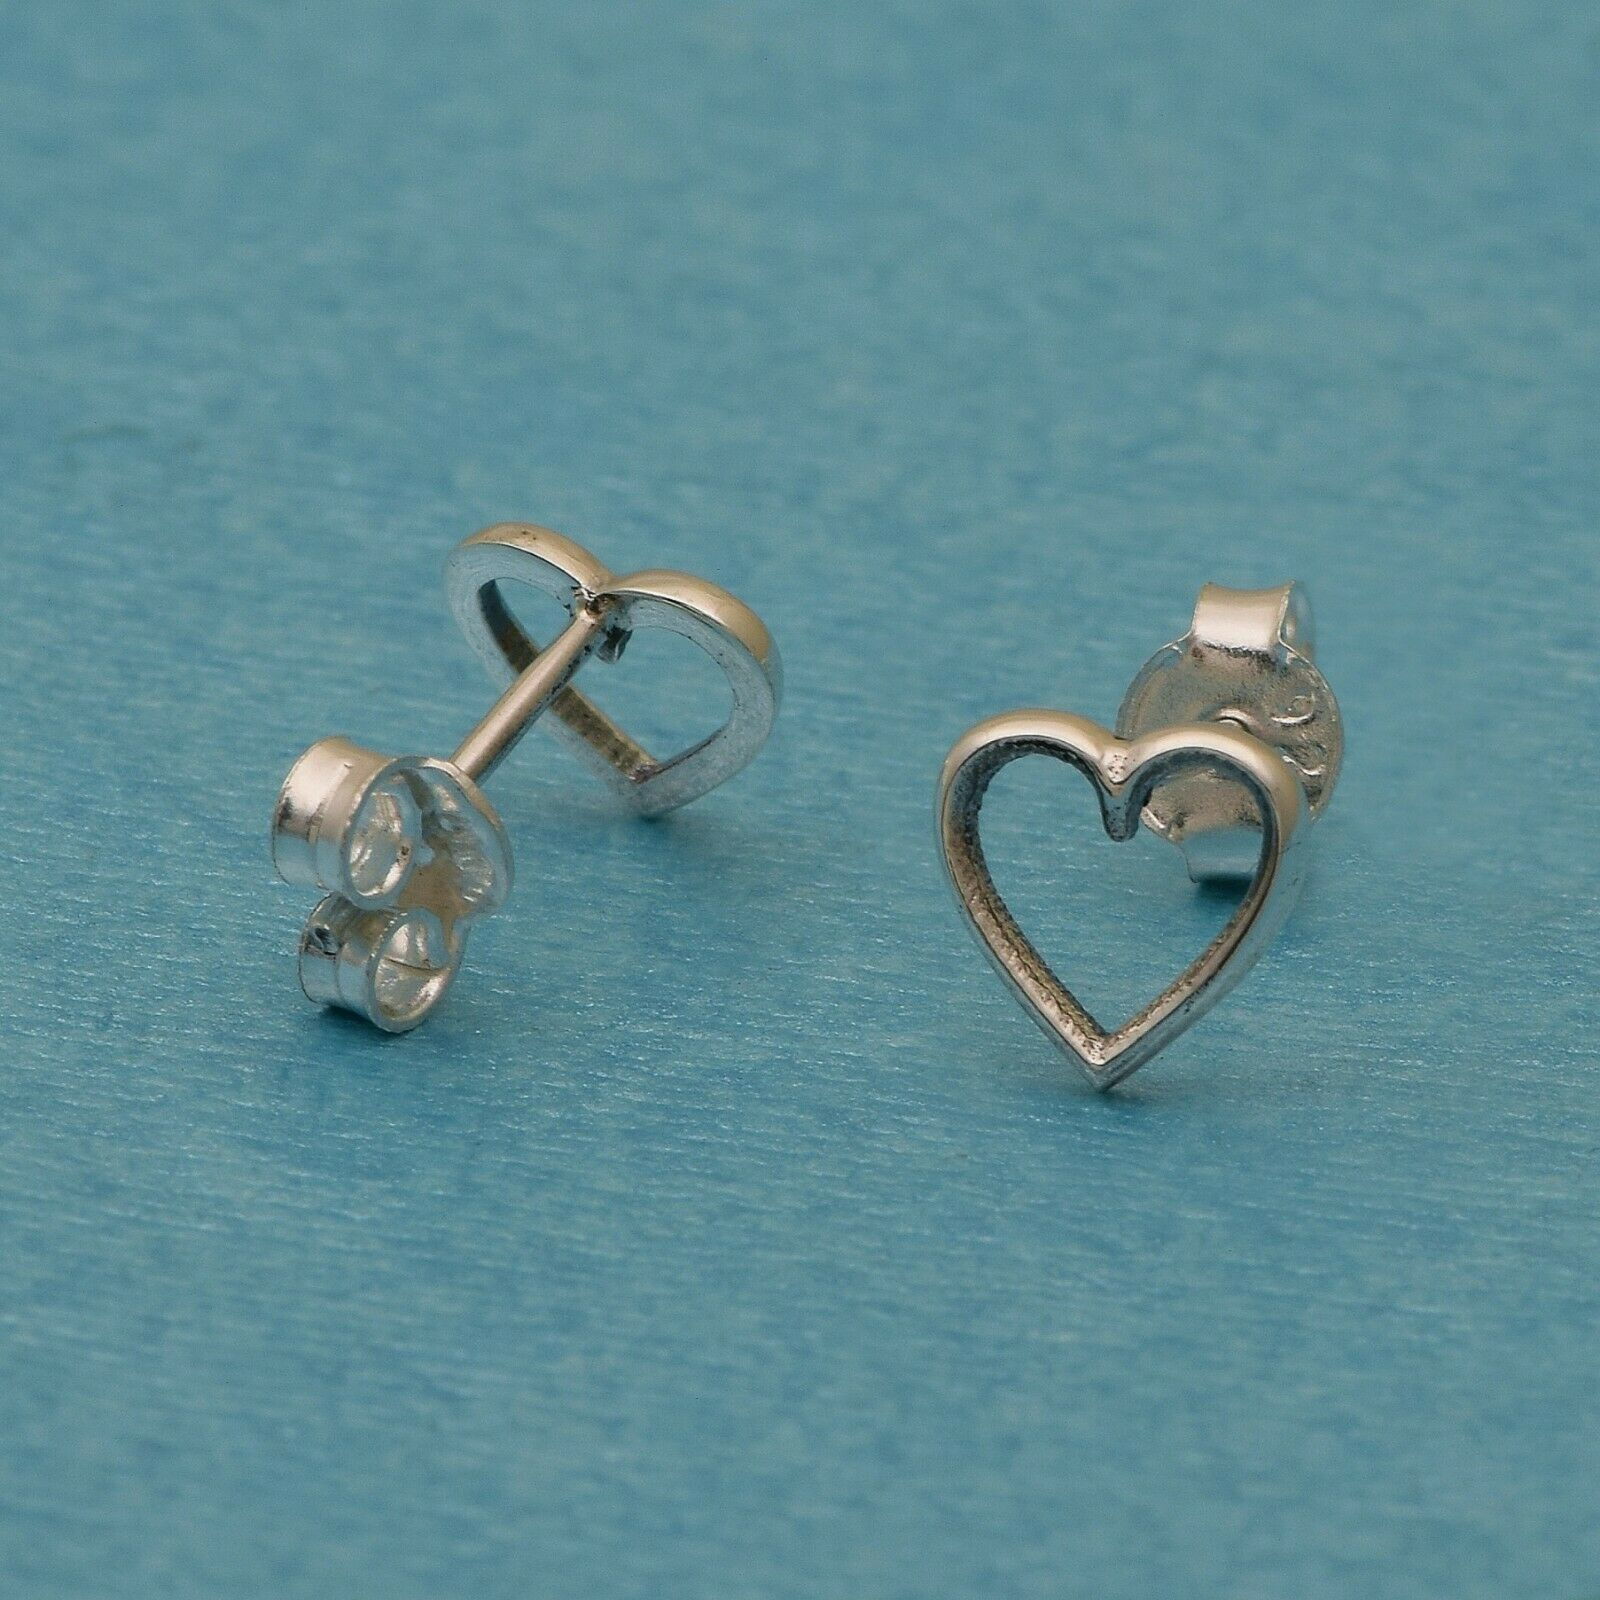 Ocean Wave,Pear Drop,Halbmond,Herz Design 925 Silber winzige Stud(Packung mit4)